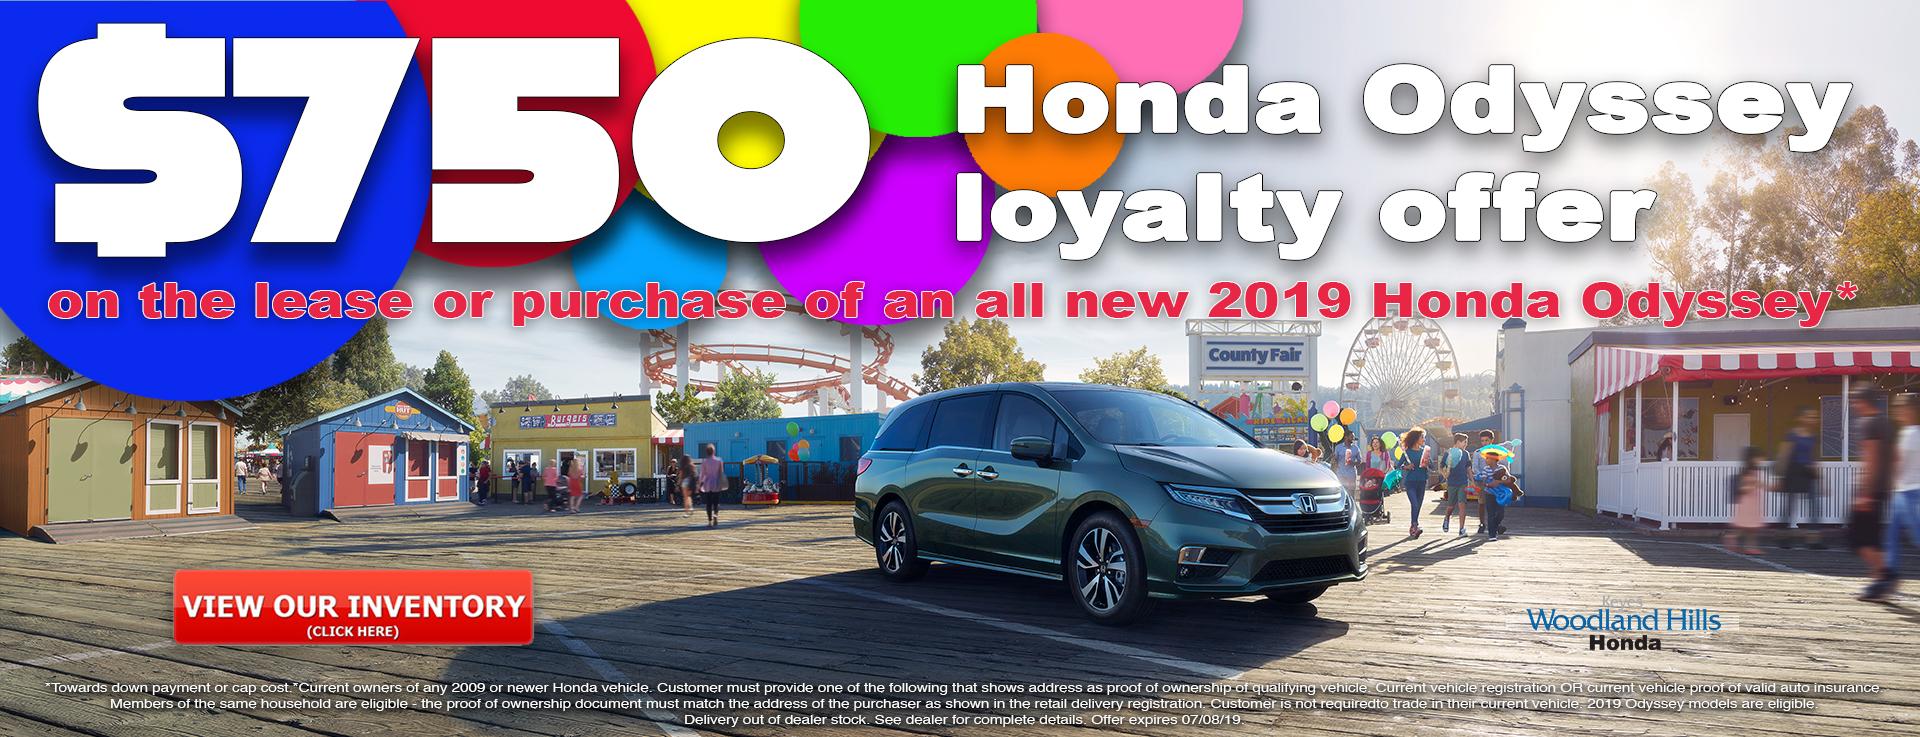 Honda Odyssey Loyalty Offer